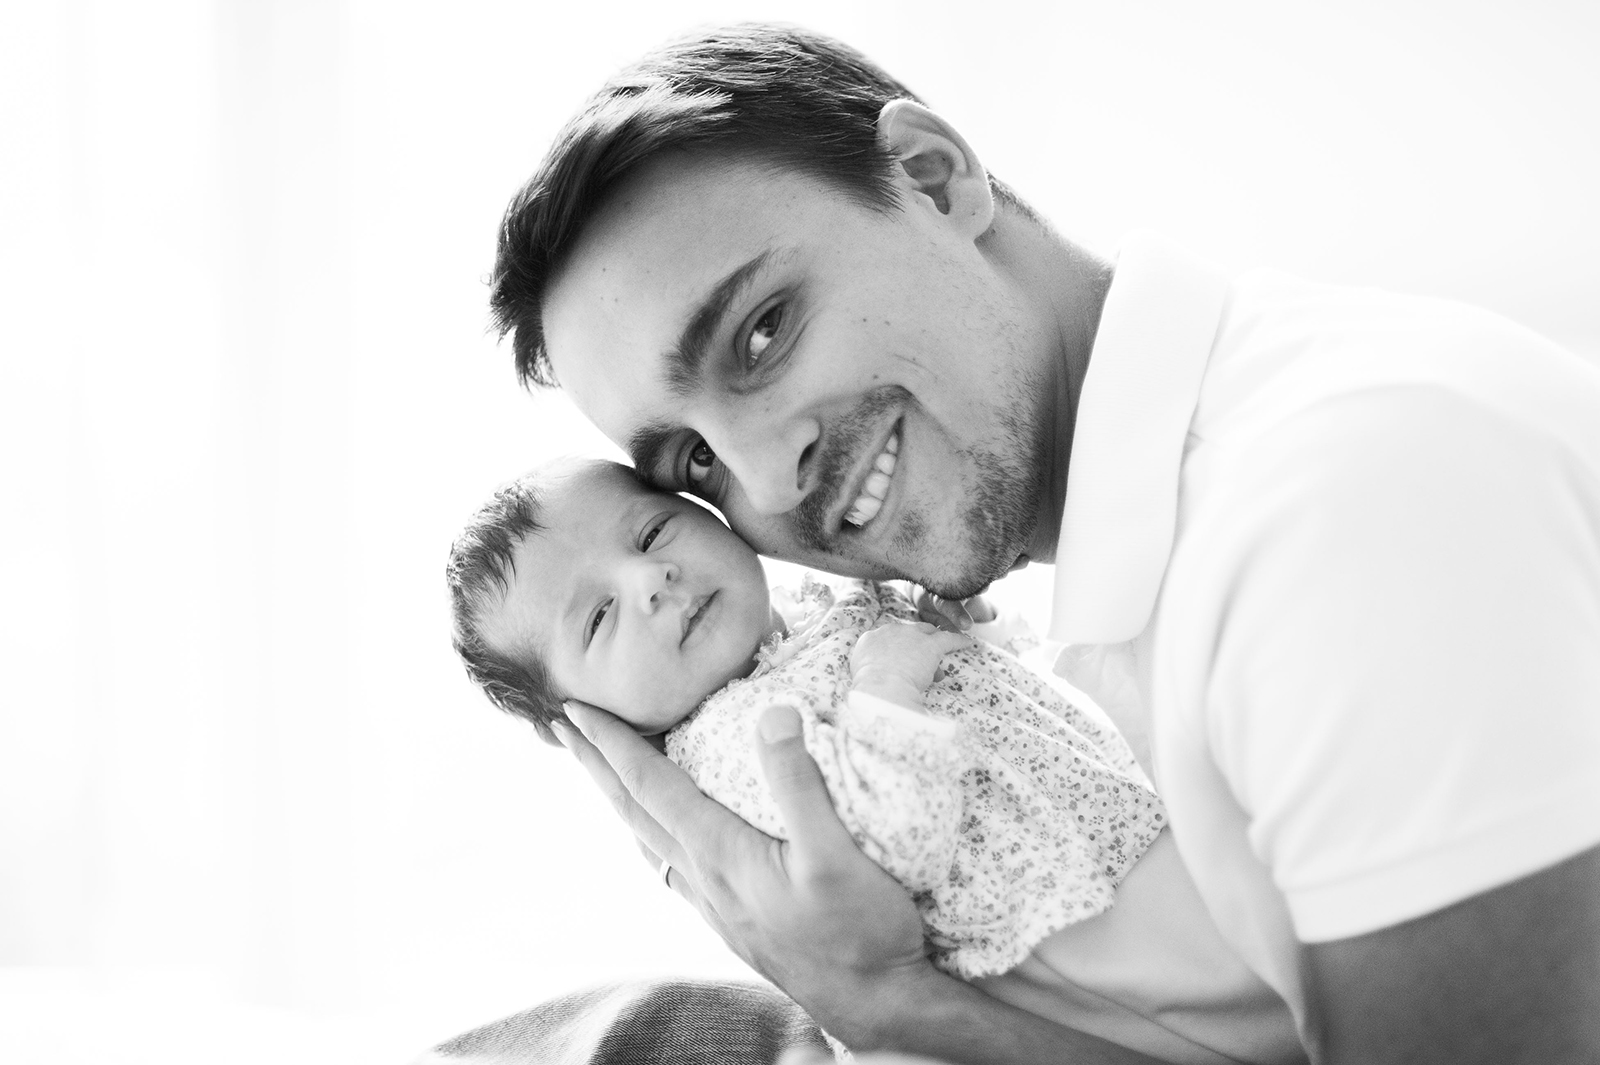 seance-photo-famille-photo-grossesse-photo-bébé-naissance-sabrina-godemert-photographe-seine-et-marne032